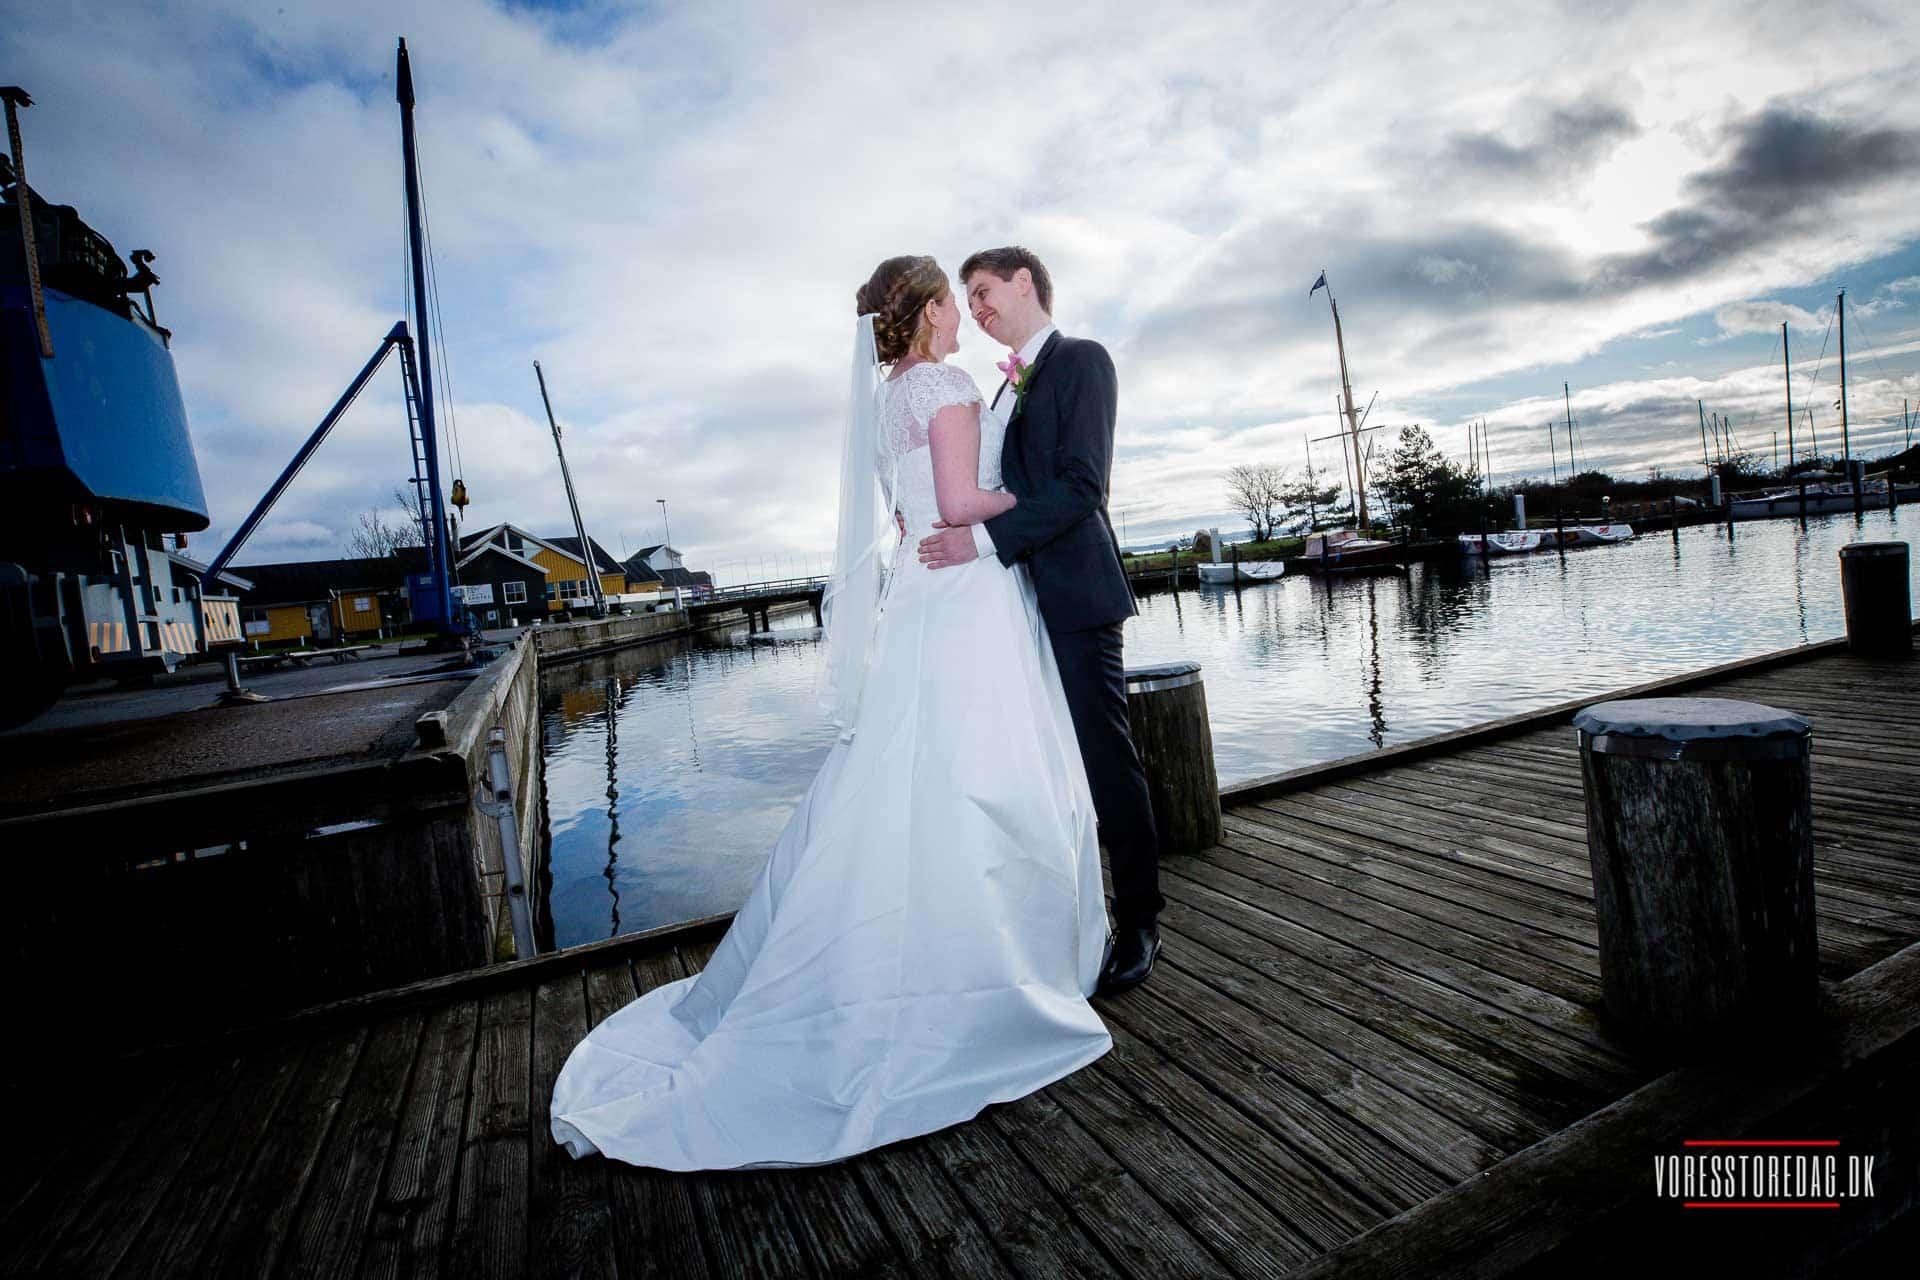 Skal i holde bryllup? Hos Kaløvig Badehotel kan vi også danne rammerne for en uforglemmelig bryllupsfest.